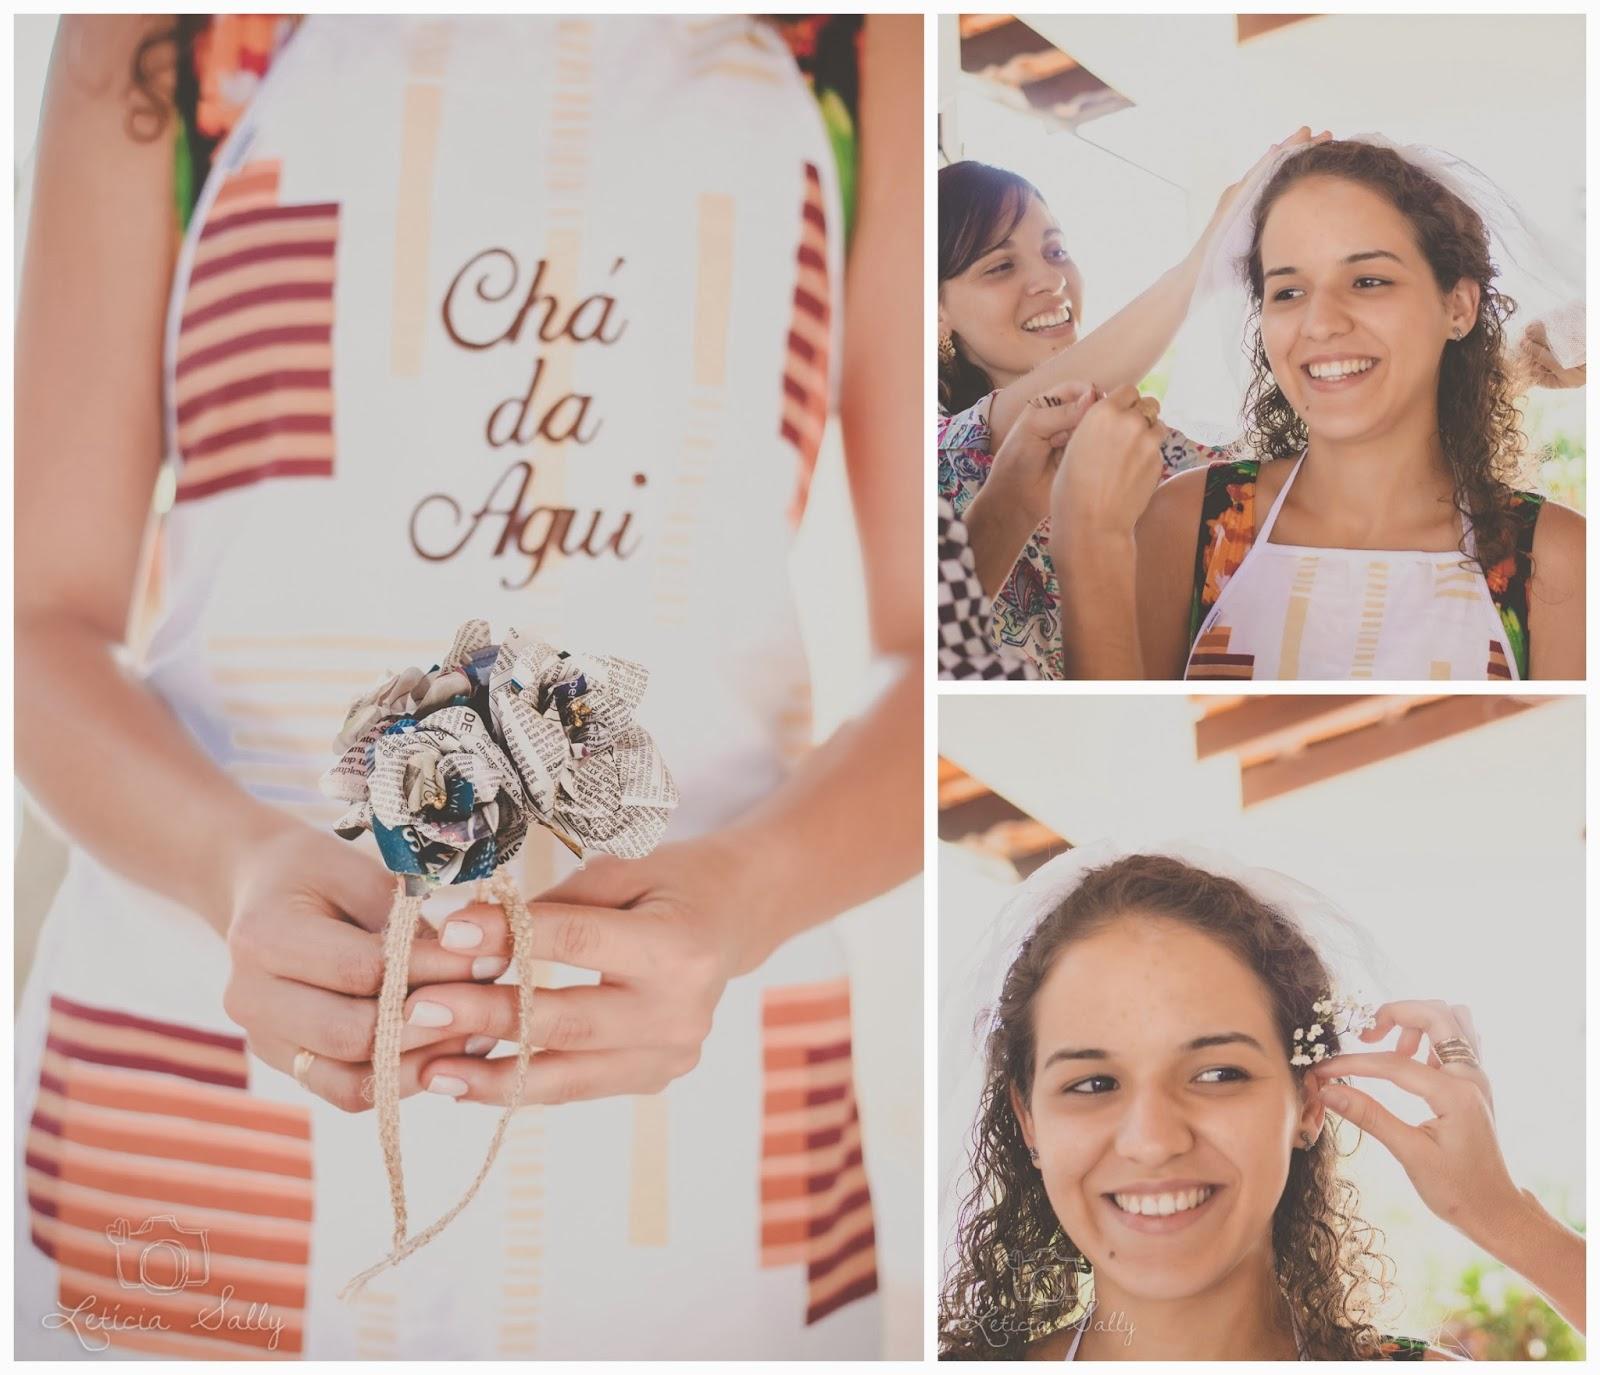 cha-panela-rustico-simples-noiva-avental-bouquet-papel